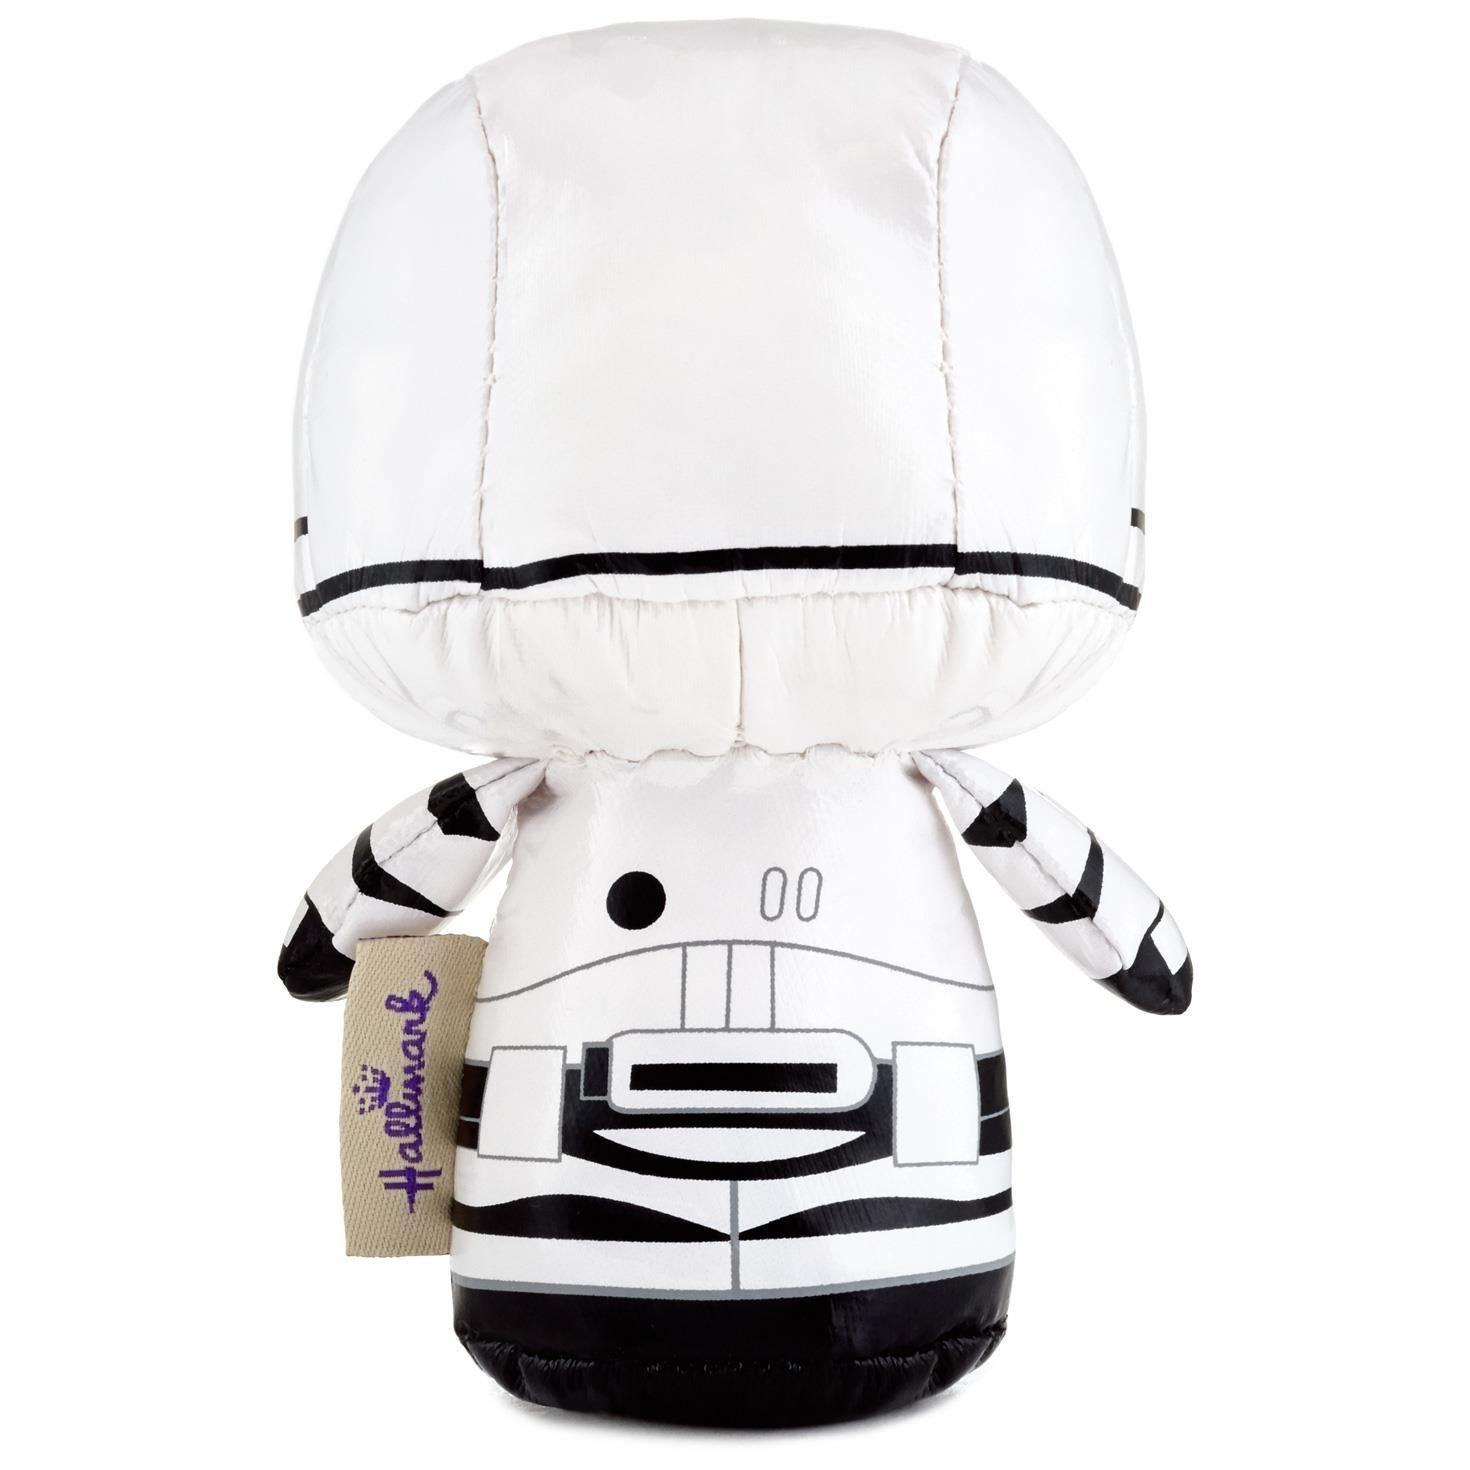 TLJ FO Stormtrooper Itty Bittys Plush Toy 2